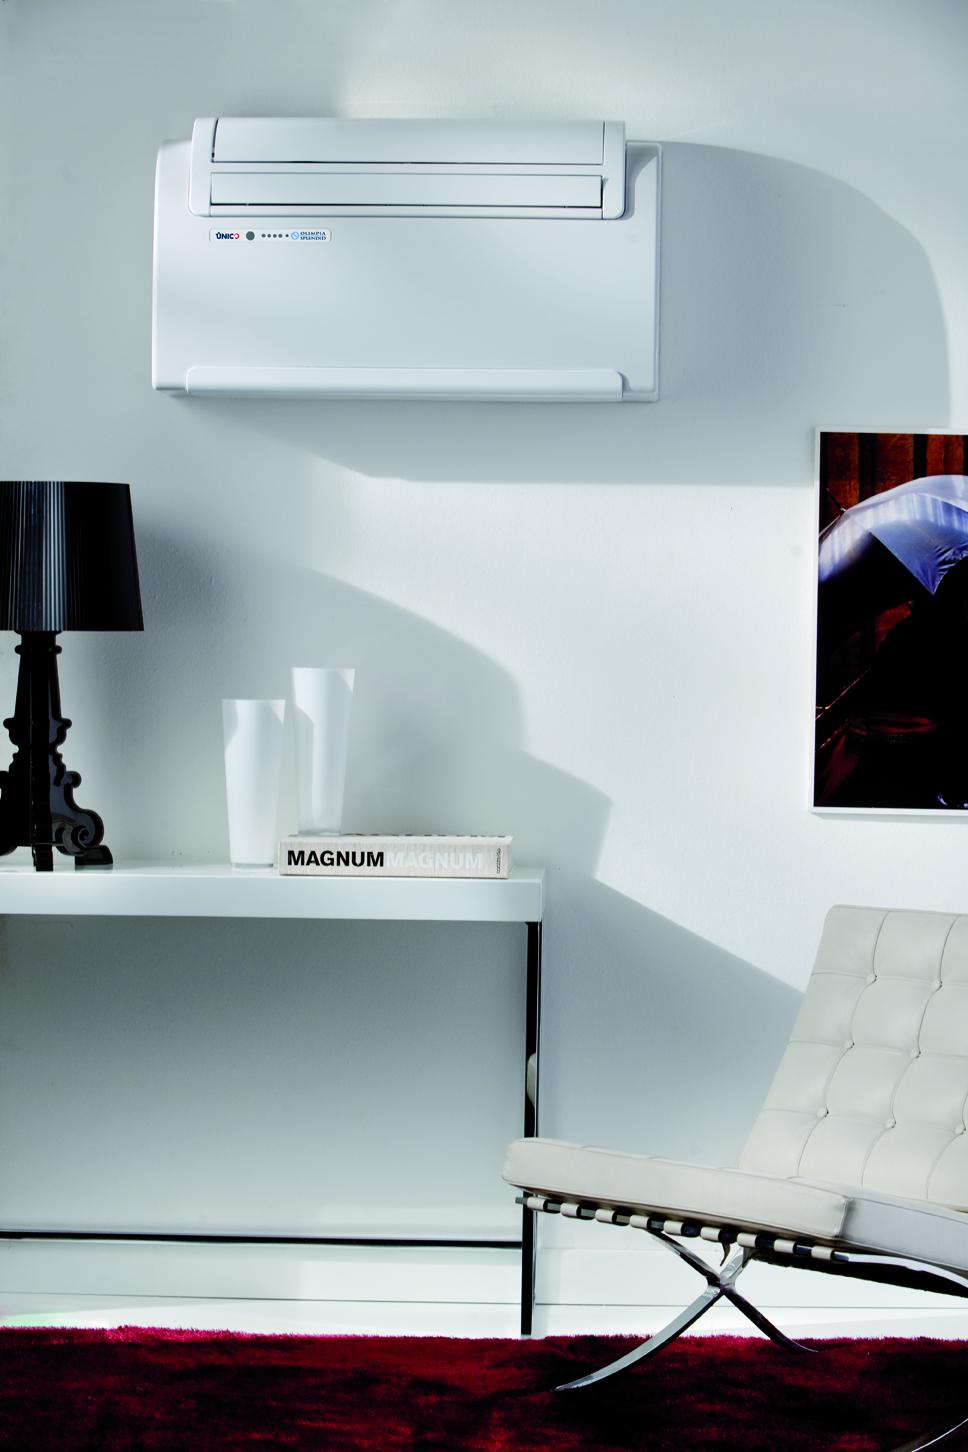 monoblock klimager t olimpia splendid dc inverter unico 12. Black Bedroom Furniture Sets. Home Design Ideas